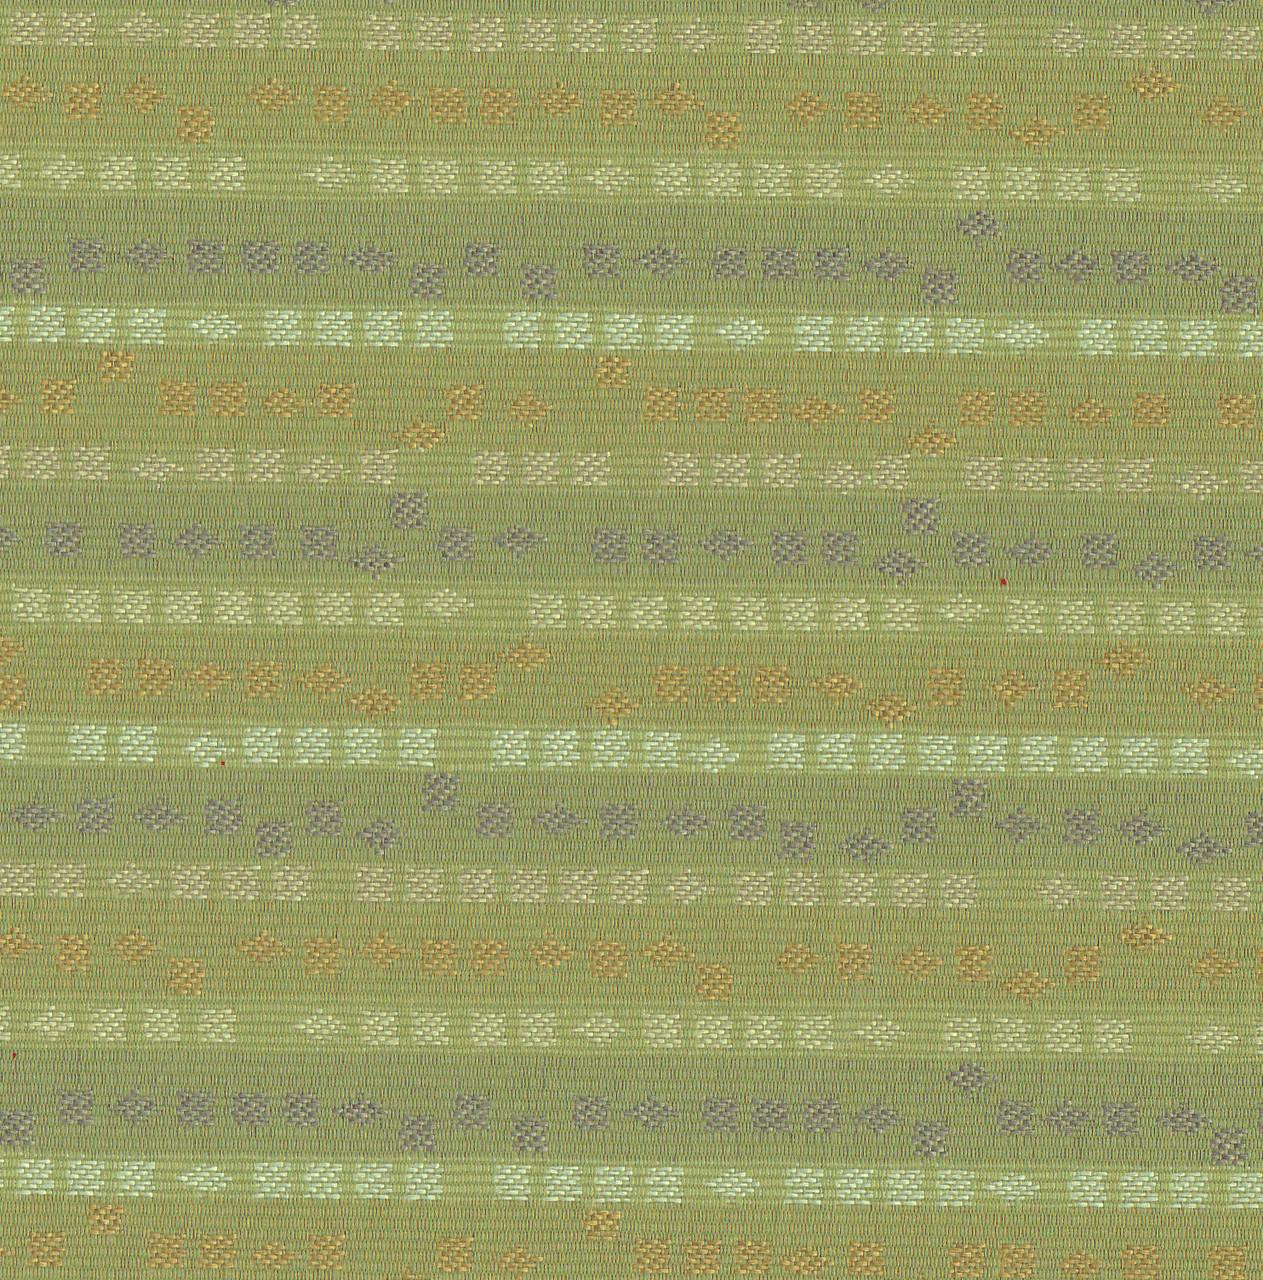 Umami Subtle Green Tea 30310104